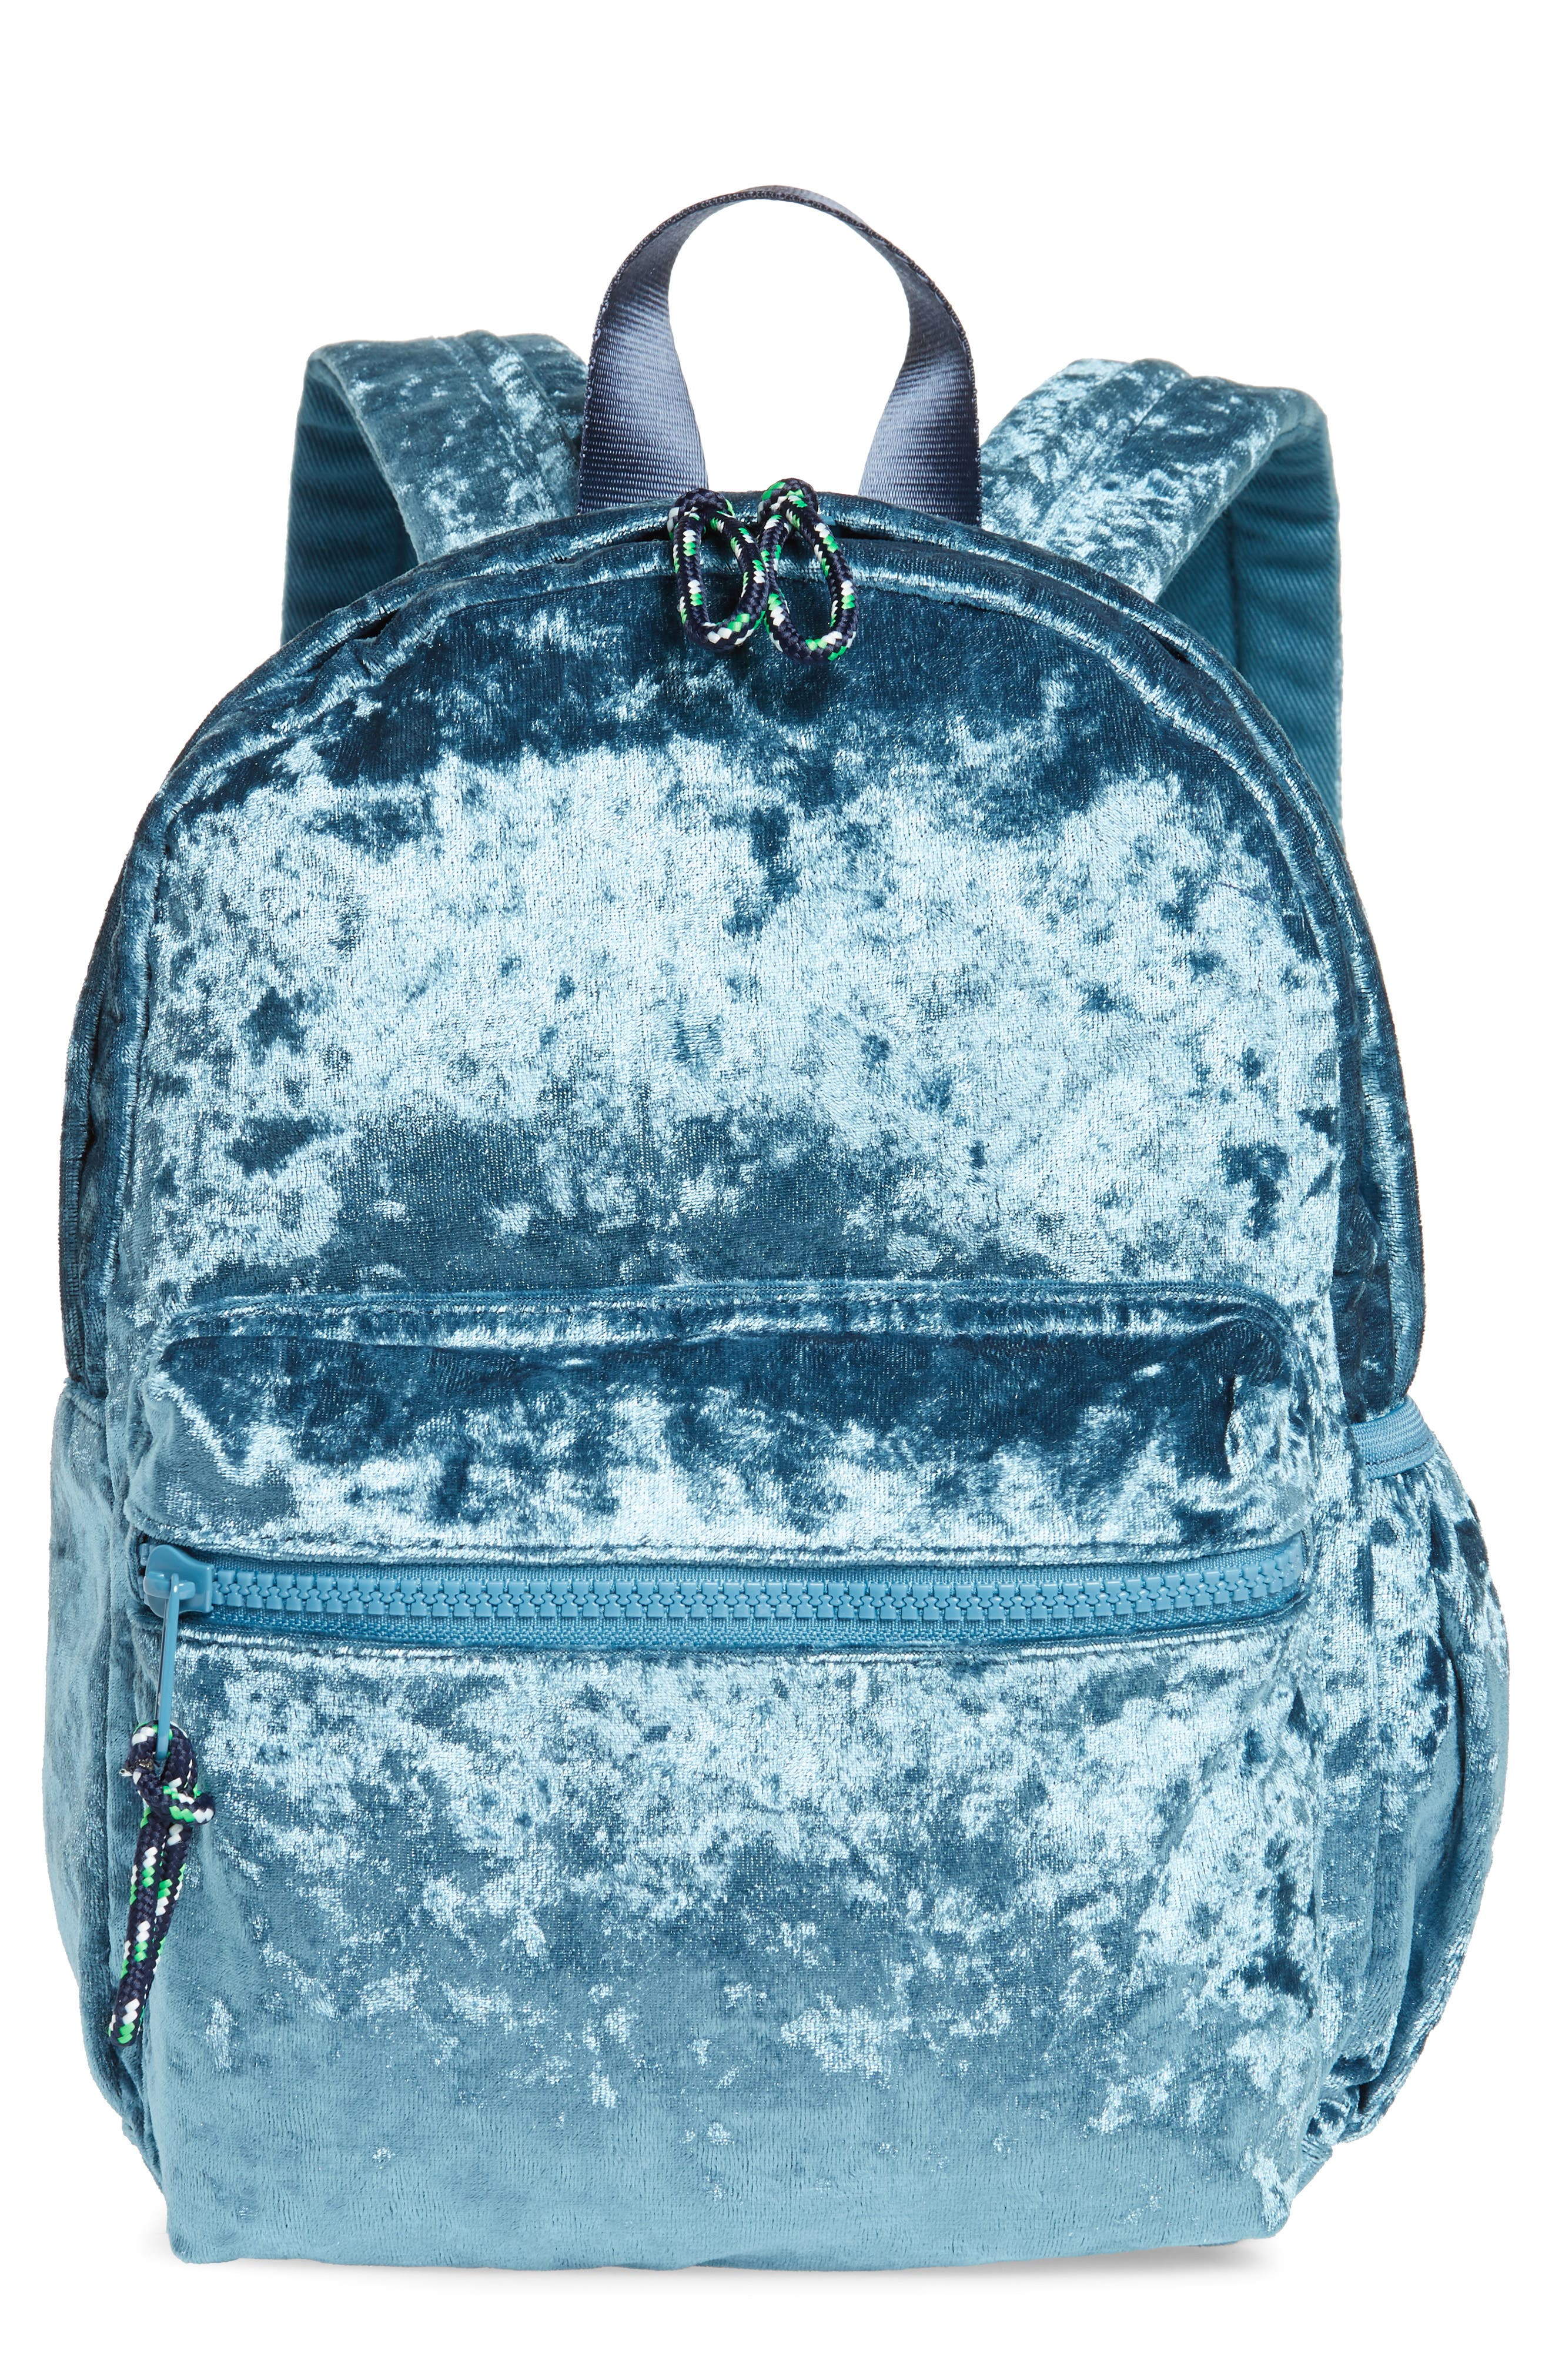 Crushed Velvet Backpack,                         Main,                         color, Brilliant Turquoise